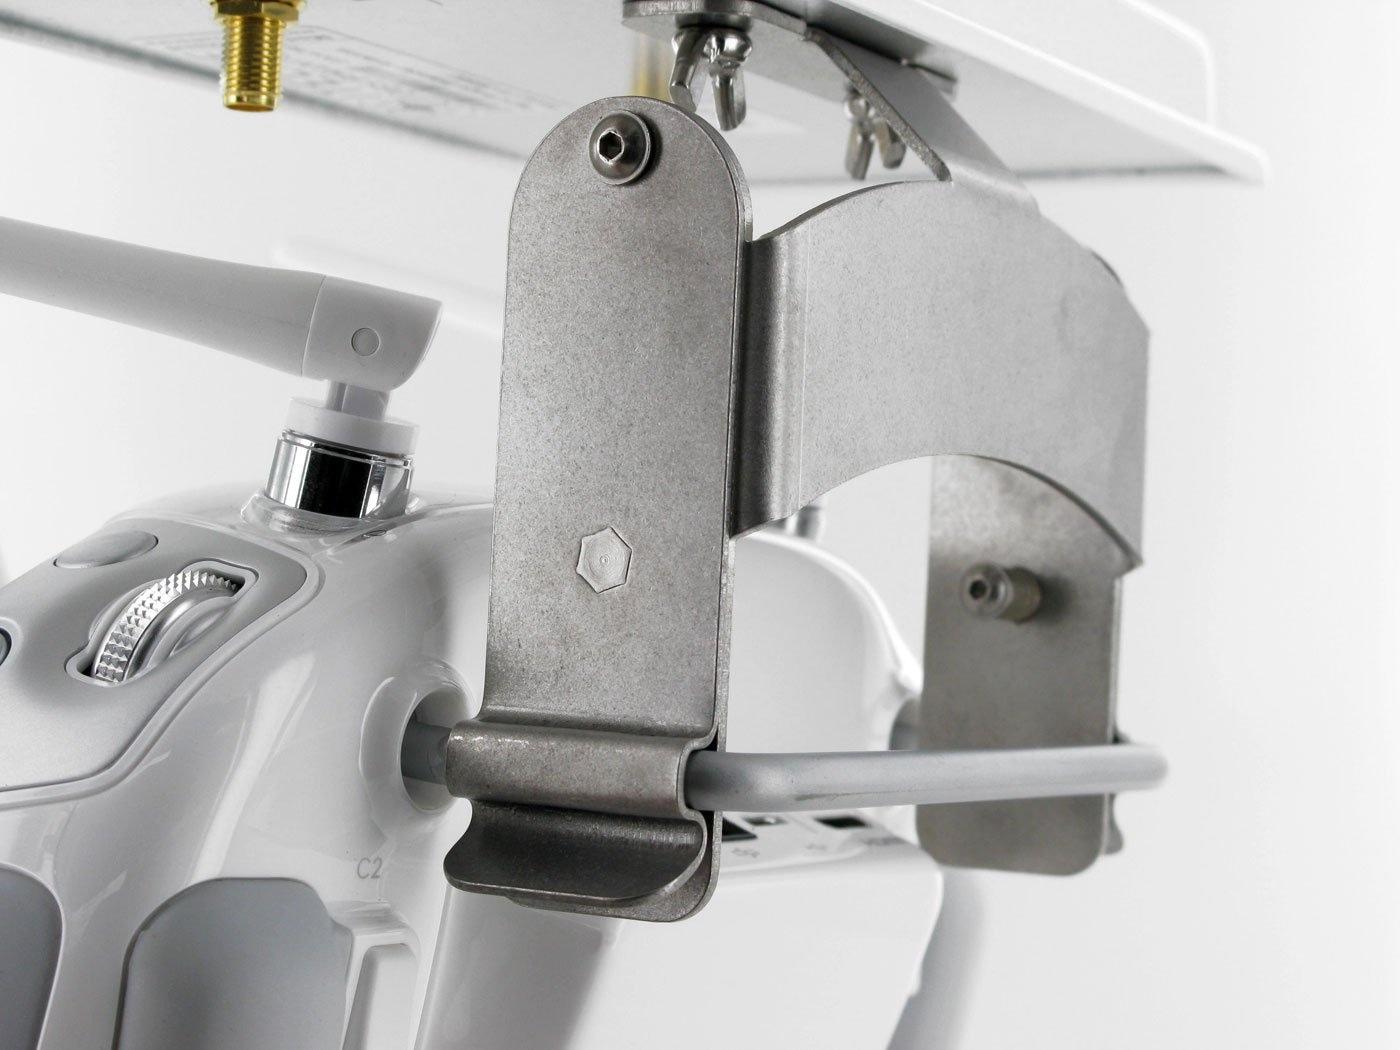 Усилитель сигнала ITElite Range Extender для Phantom/Matrice 100/Inspire 1-4